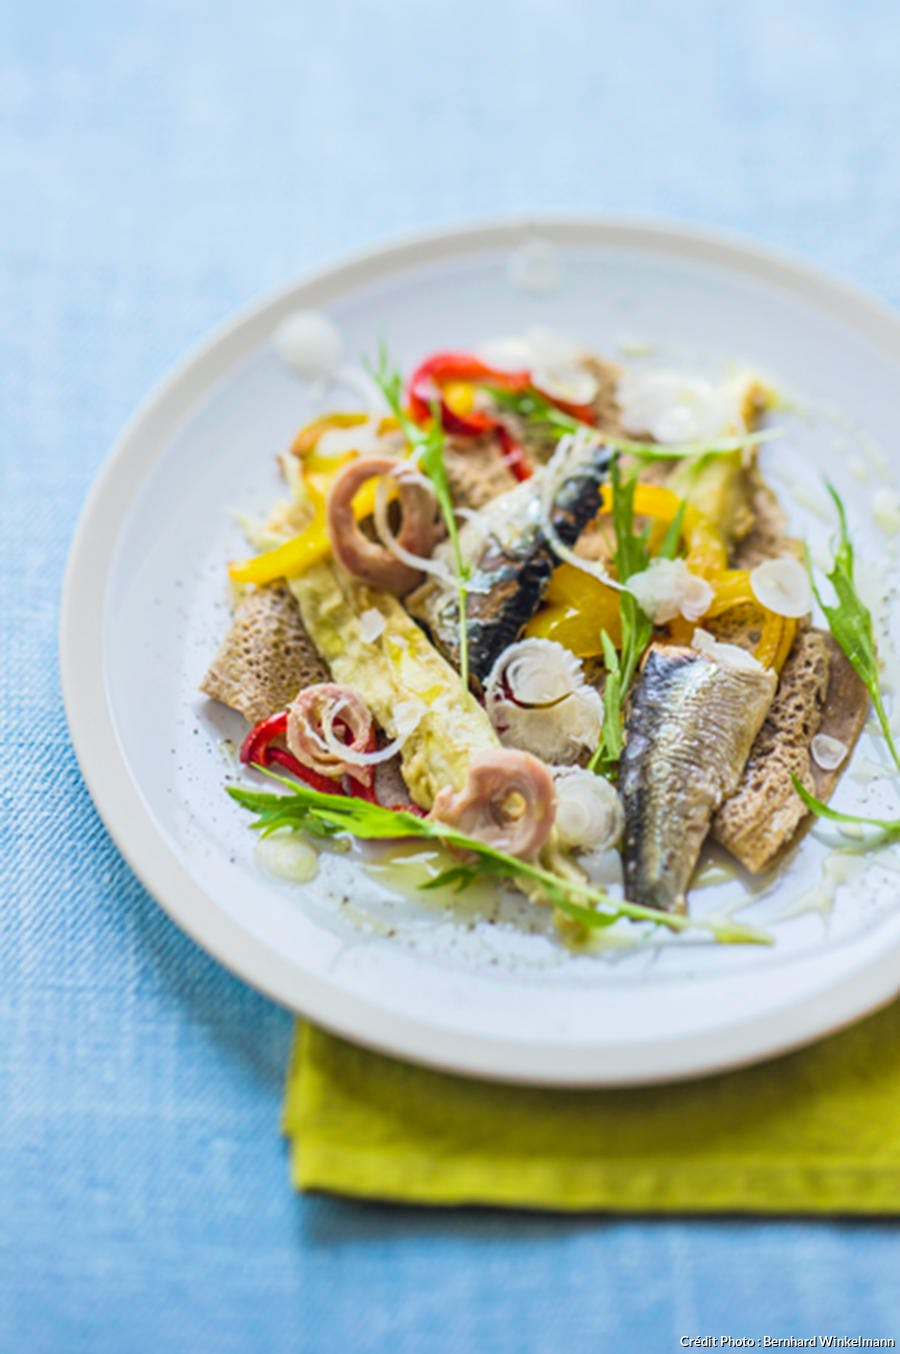 r48_galette-ble-noir-sardine-andouille_bw.jpg